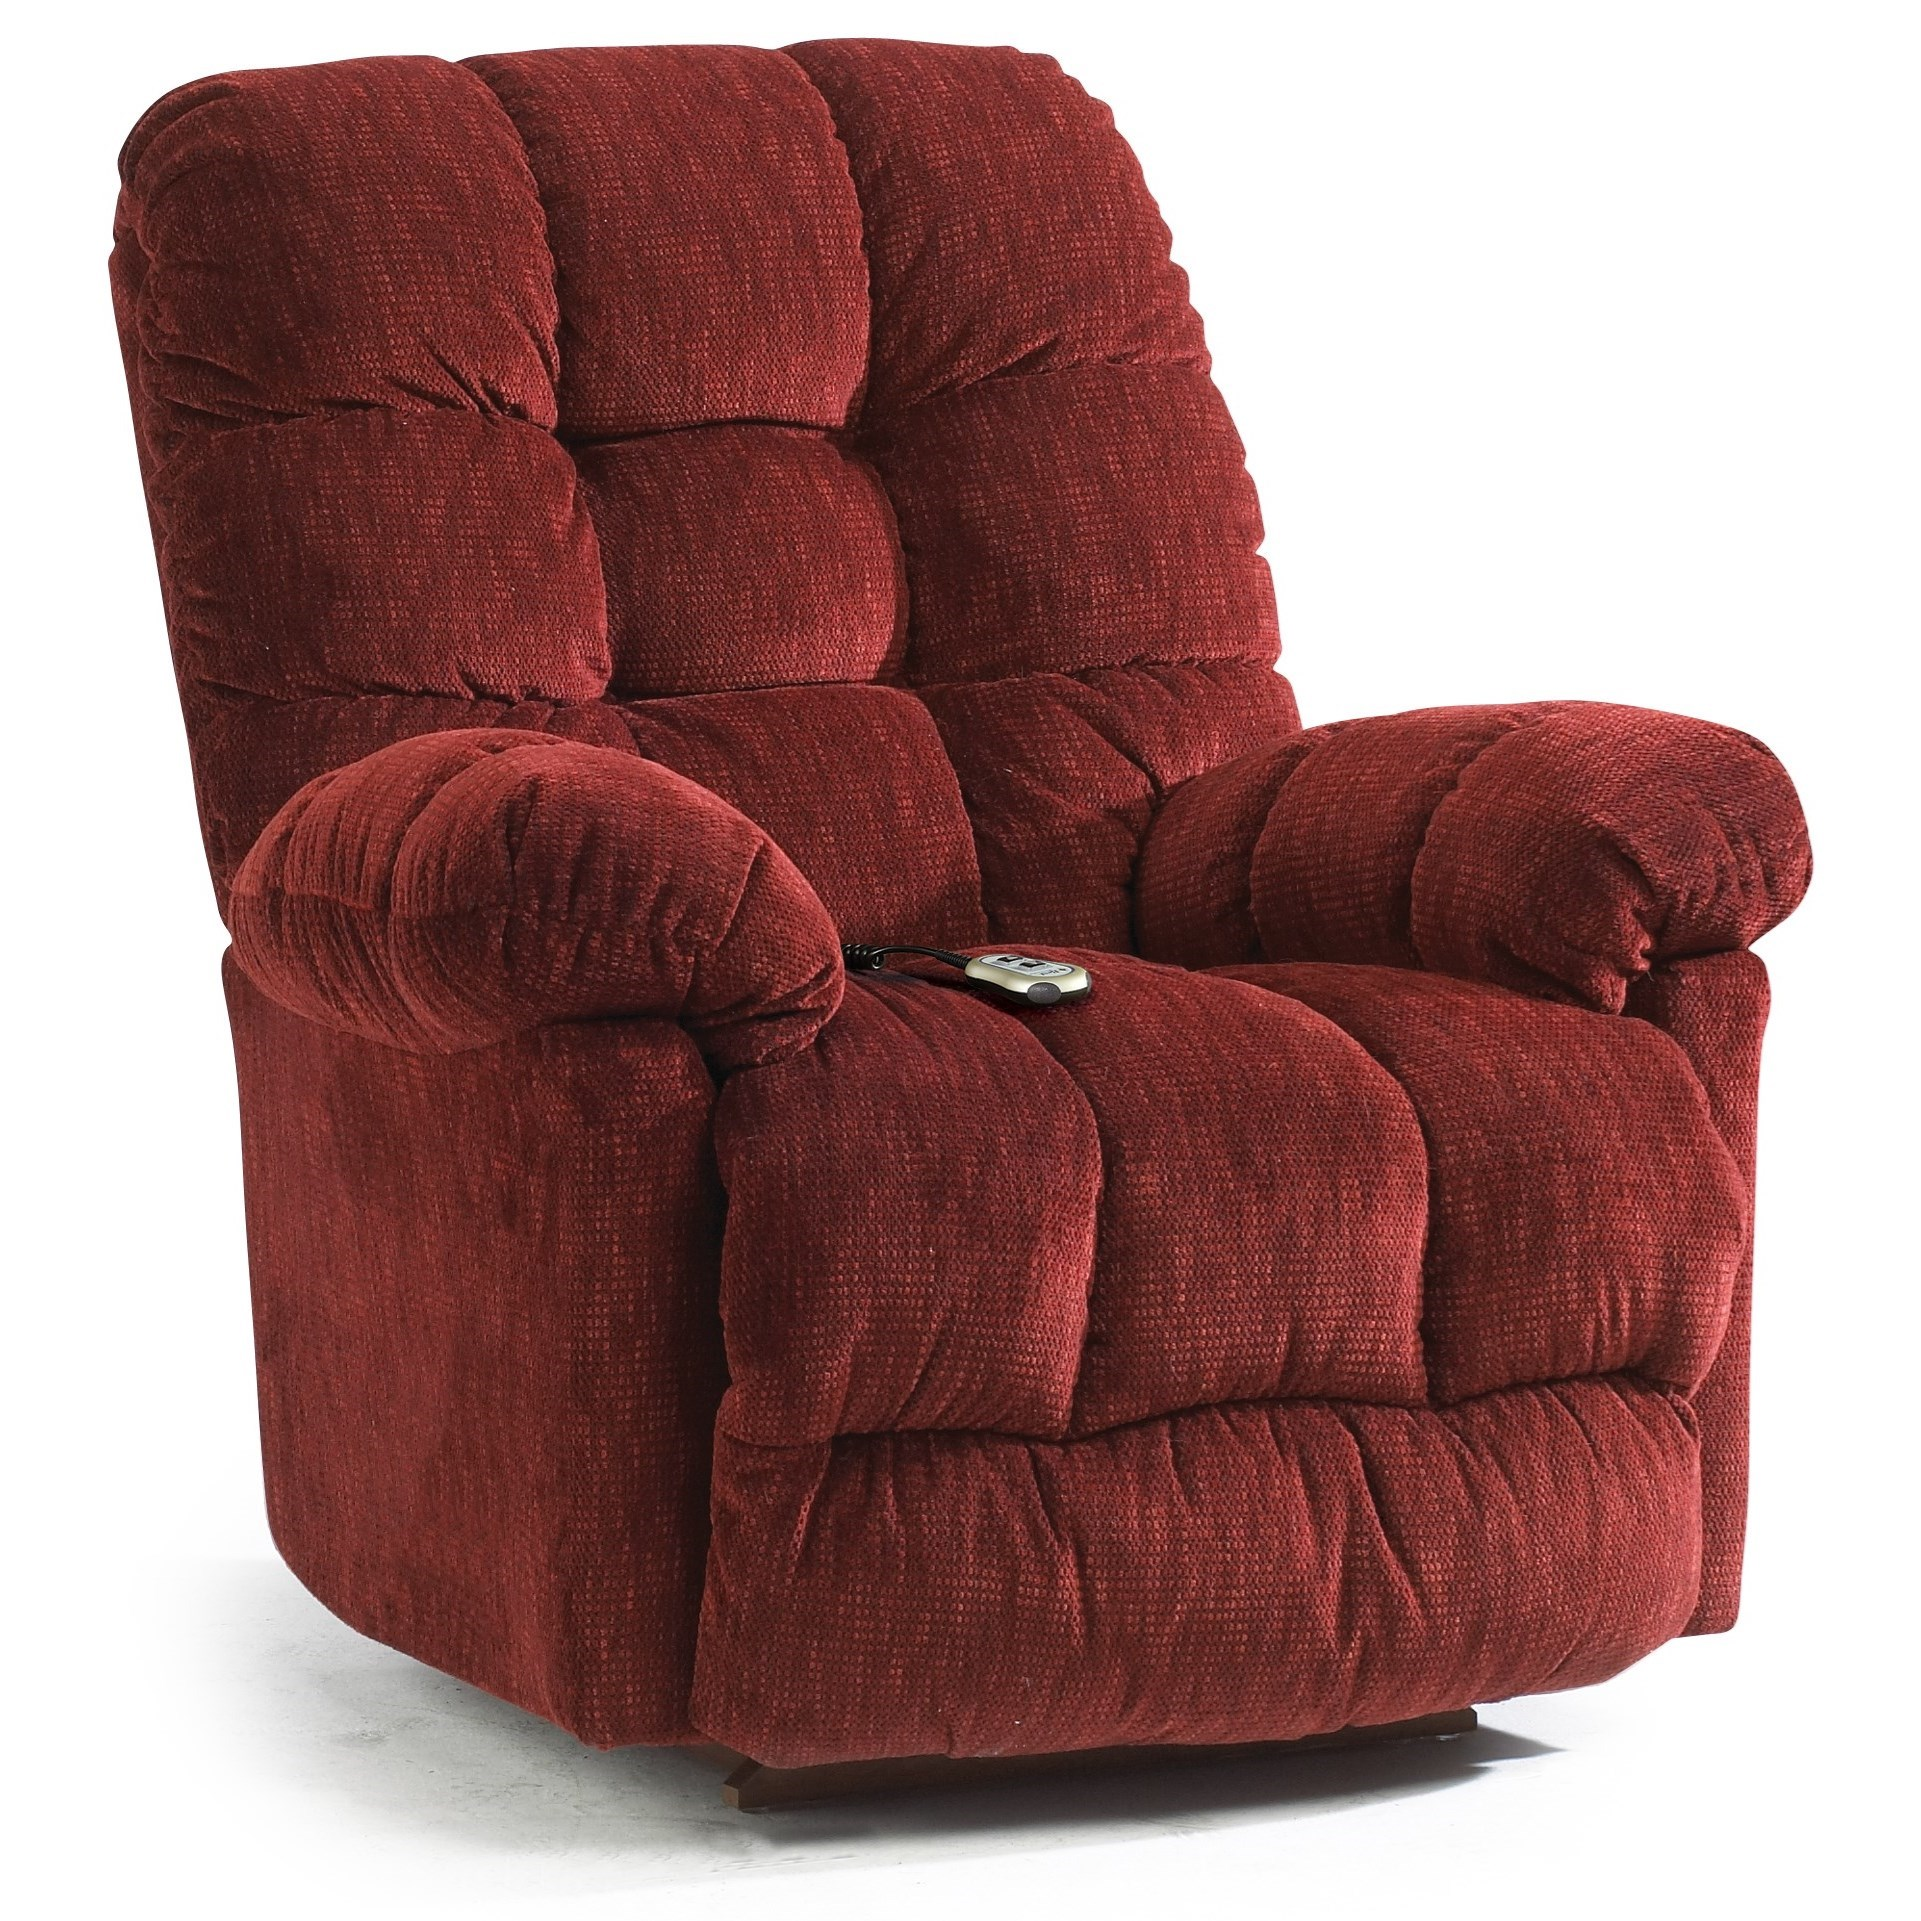 Best Home Furnishings Recliners - Medium Power Wallhugger Recliner w/ Pwr Headrest  - Item Number: 9MZ84-1